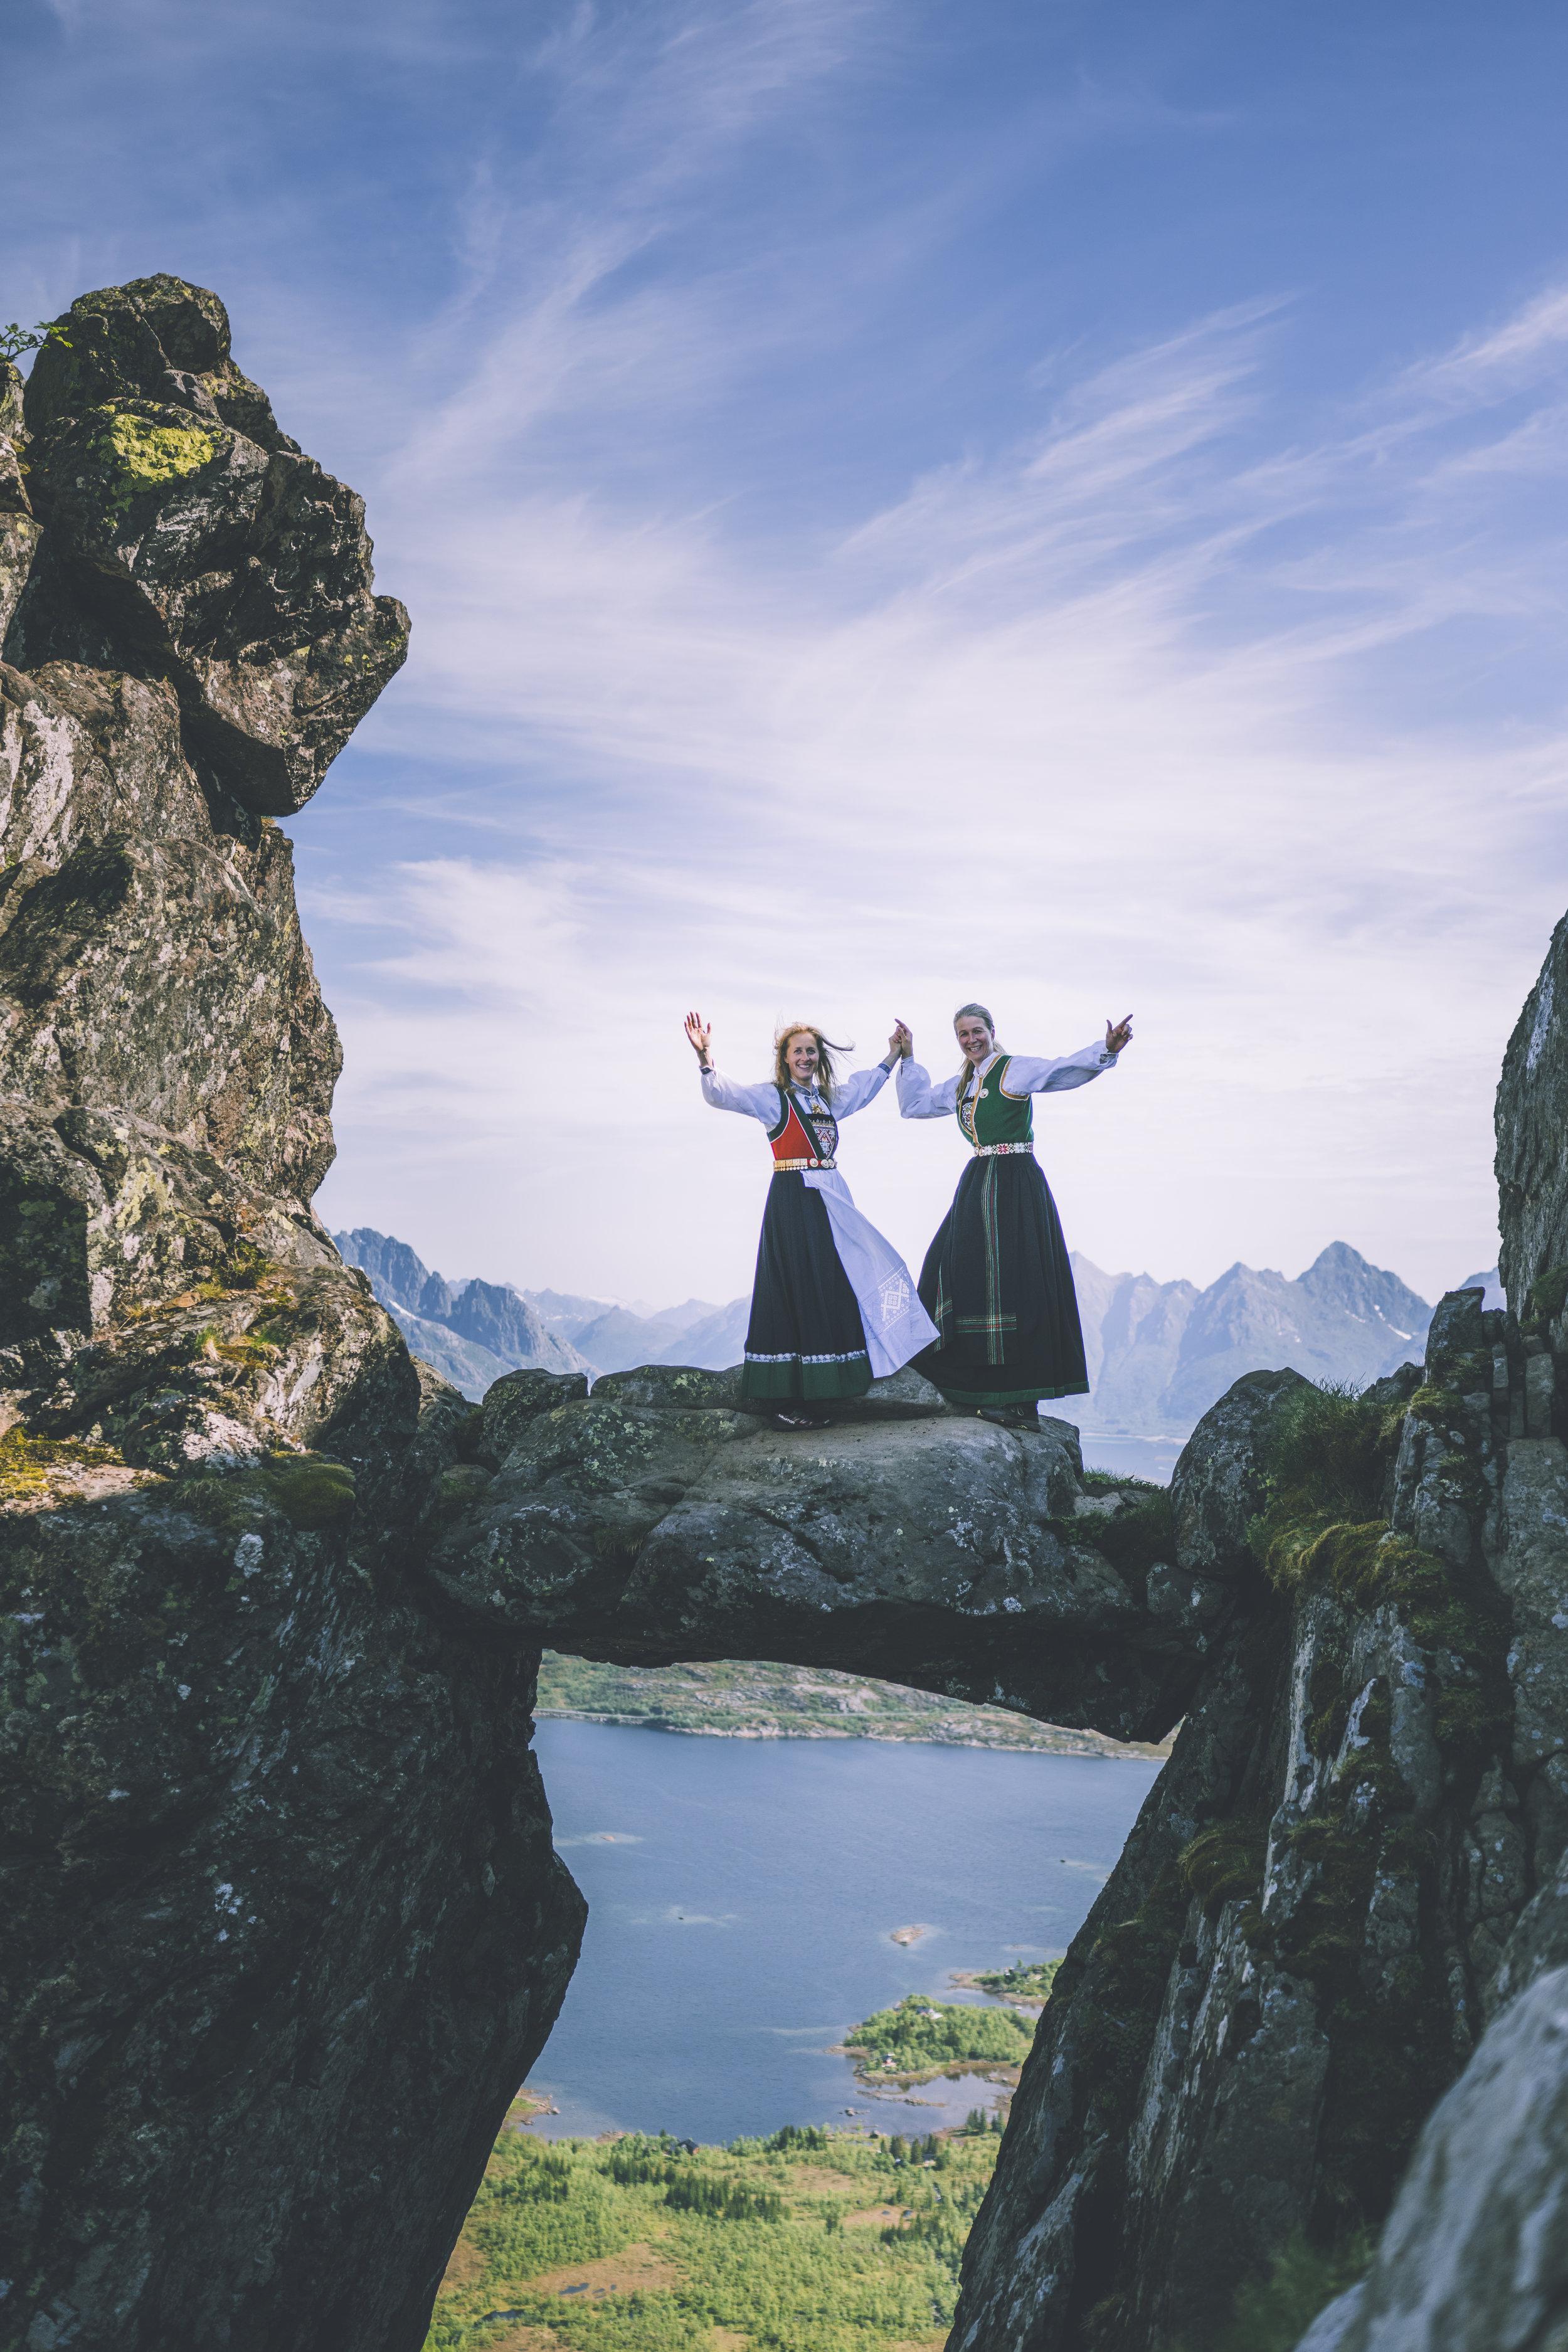 Topptur til Djevelporten i Svolvær. Foto: Marius Dalseg Sætre/Turistforeningen